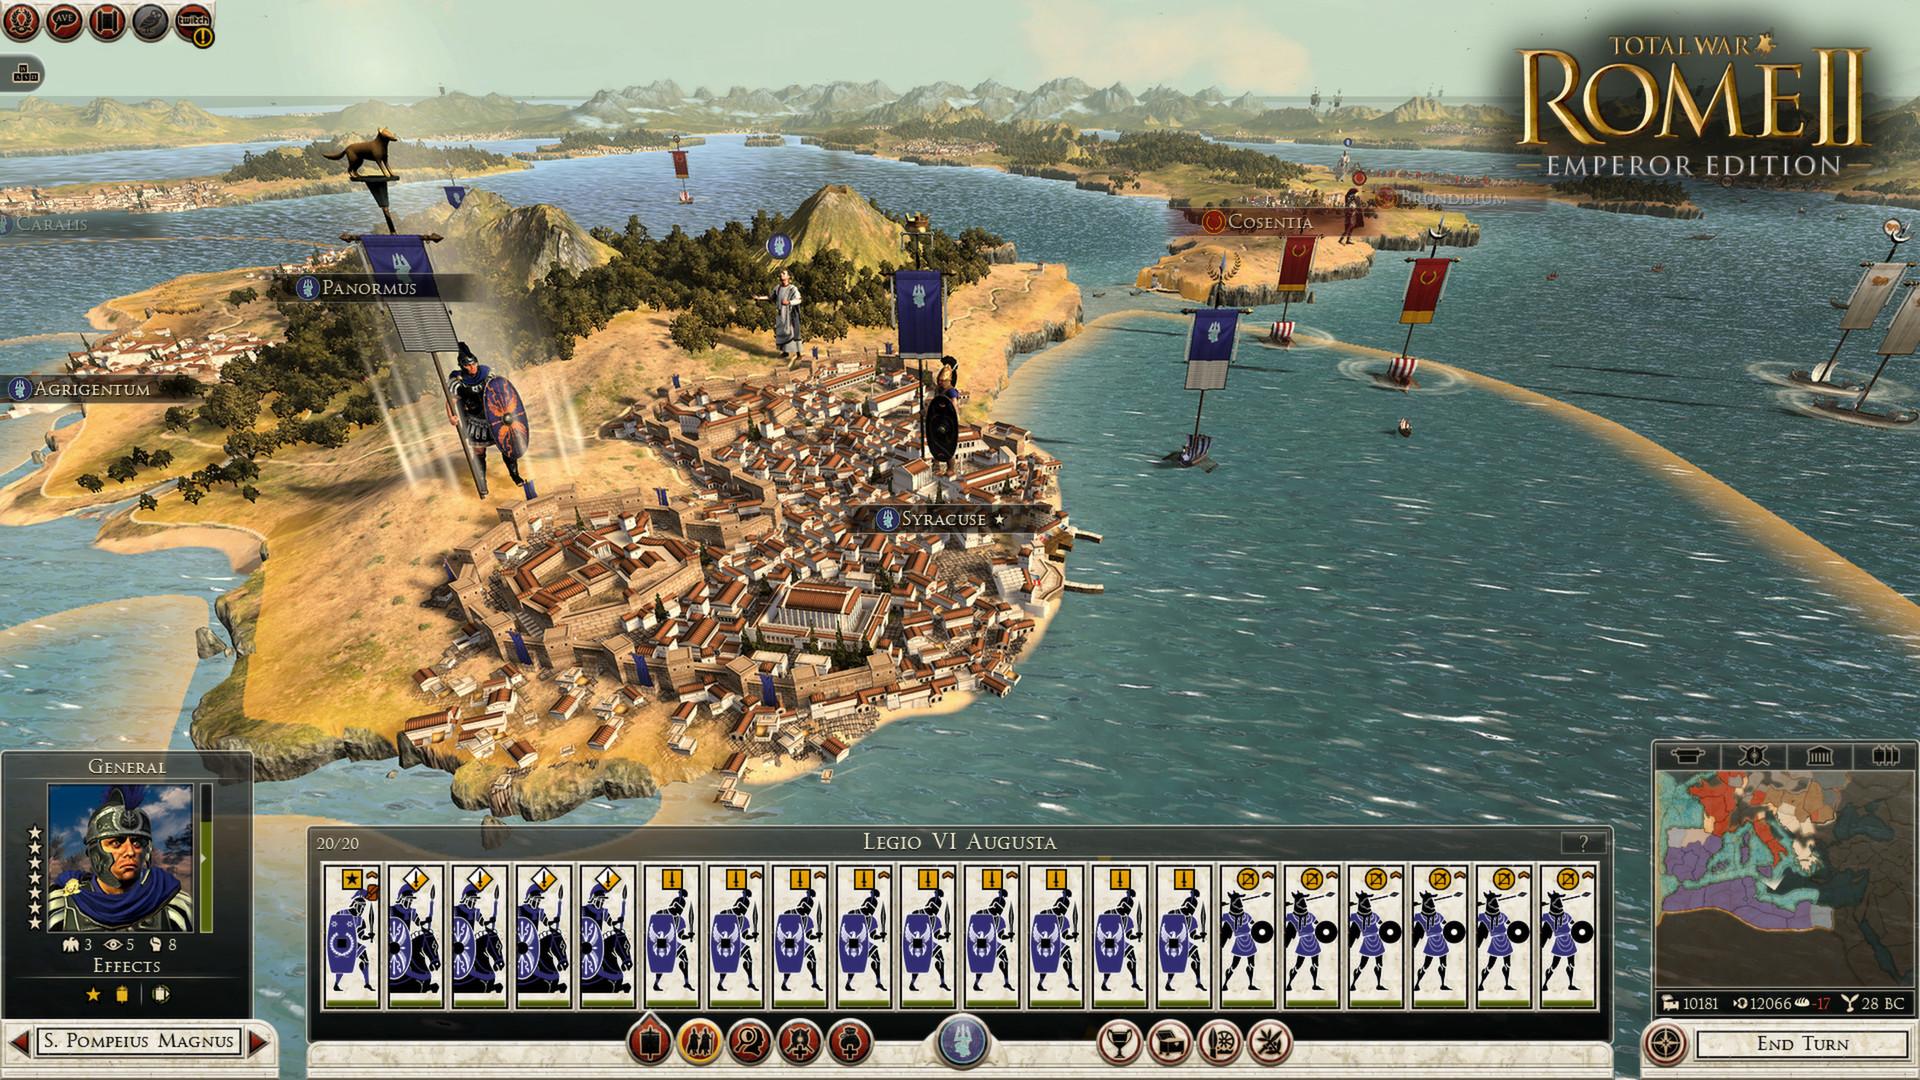 Total war: rome 2 emperor edition трейнер trainer +15 v2. 2. 0 build.